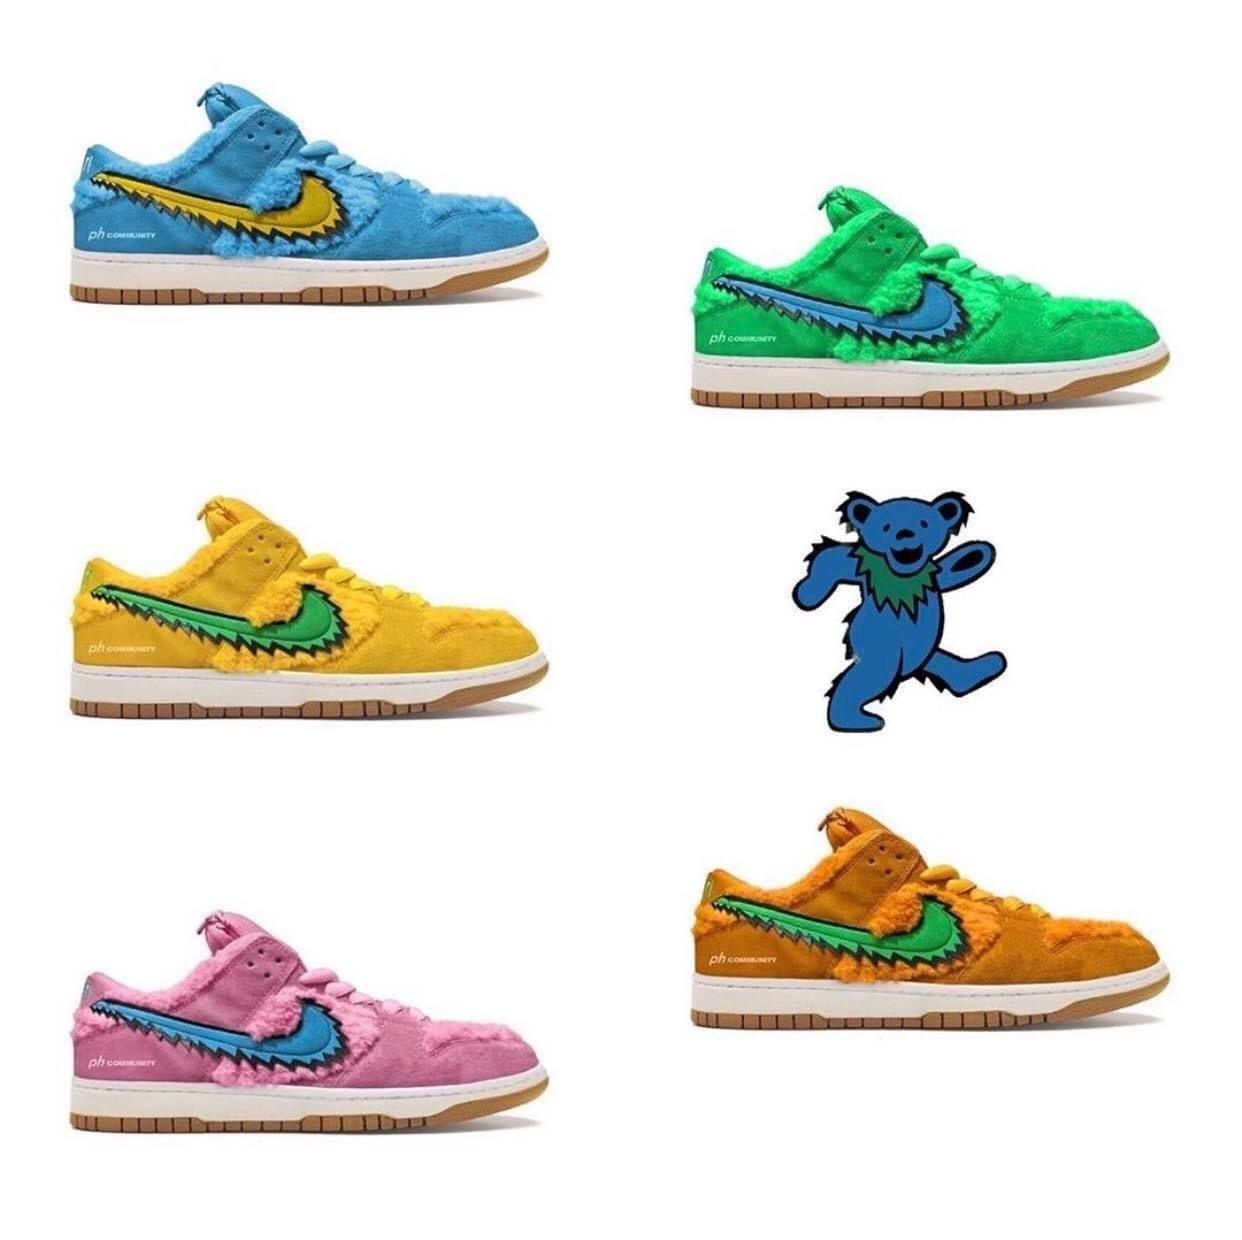 The Greatful Dead Bears X Nike Sb Dunk Red Nike Shoes Sneakers Fashion Jordan Shoes Girls